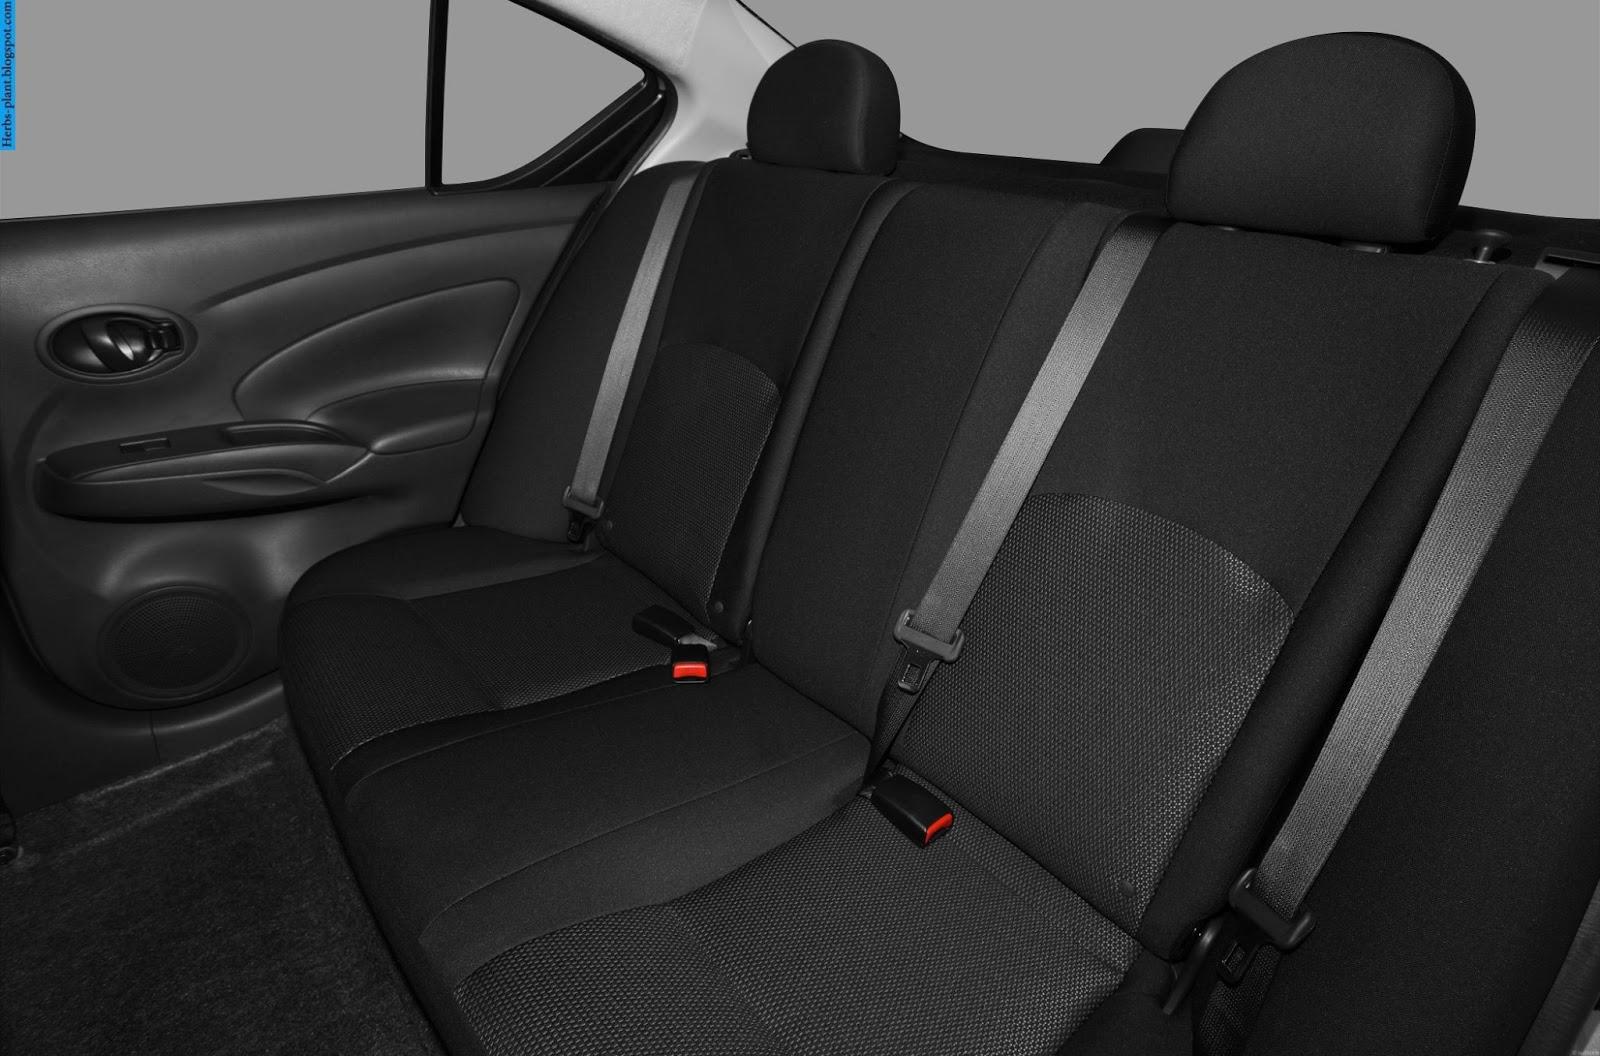 Nissan versa car 2013 interior - صور سيارة نيسان فيرسا 2013 من الداخل